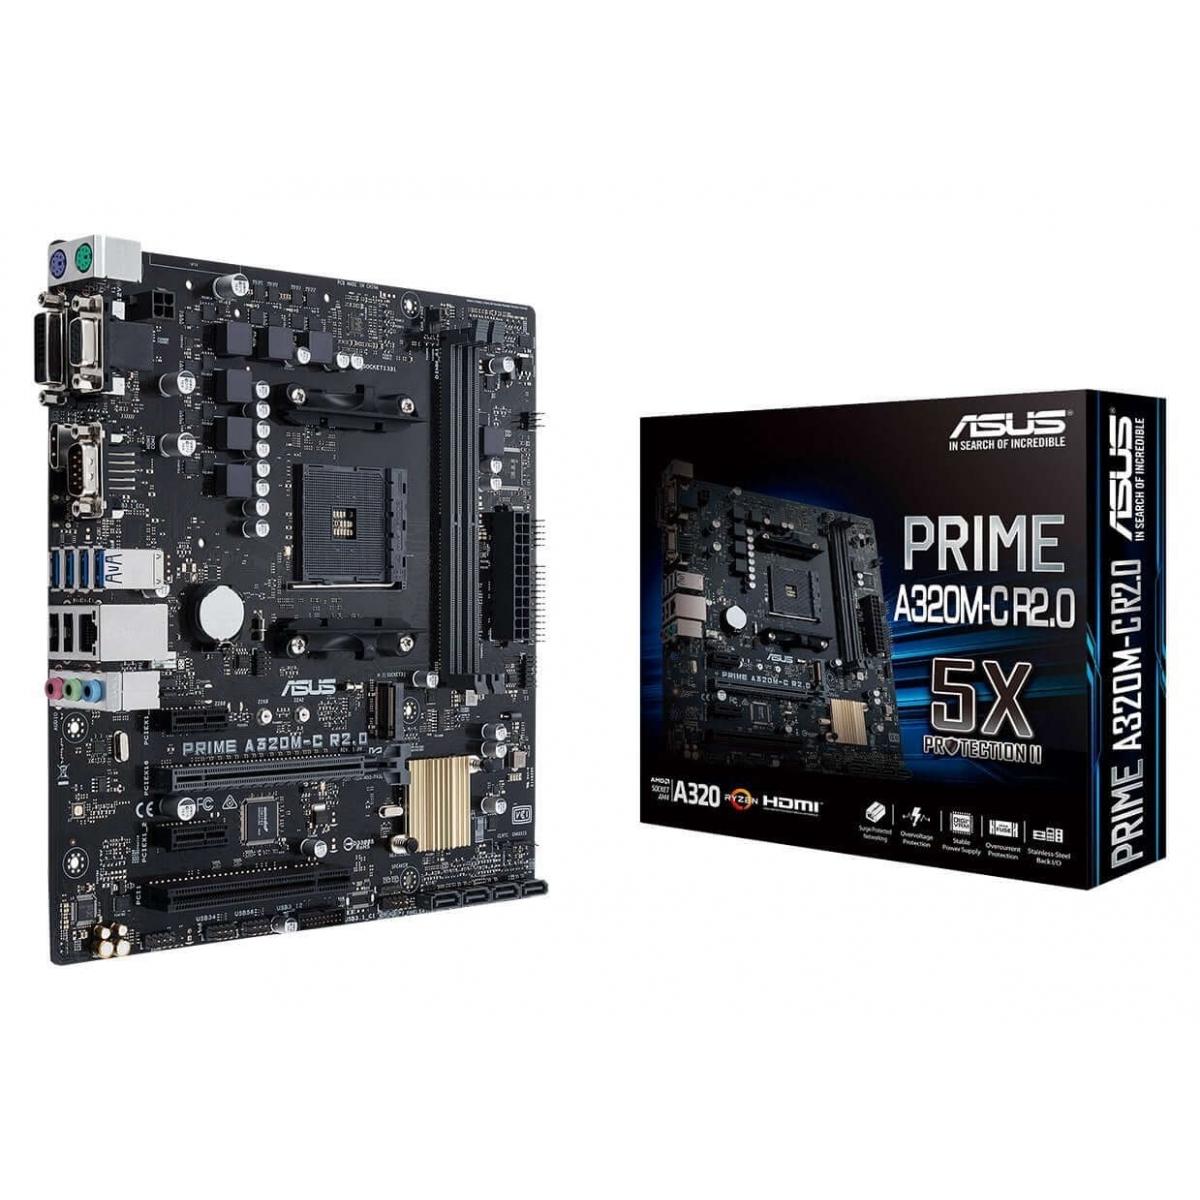 Placa Mãe Asus PRIME A320M-C R2.0, Chipset A320, AMD AM4, mATX, DDR4